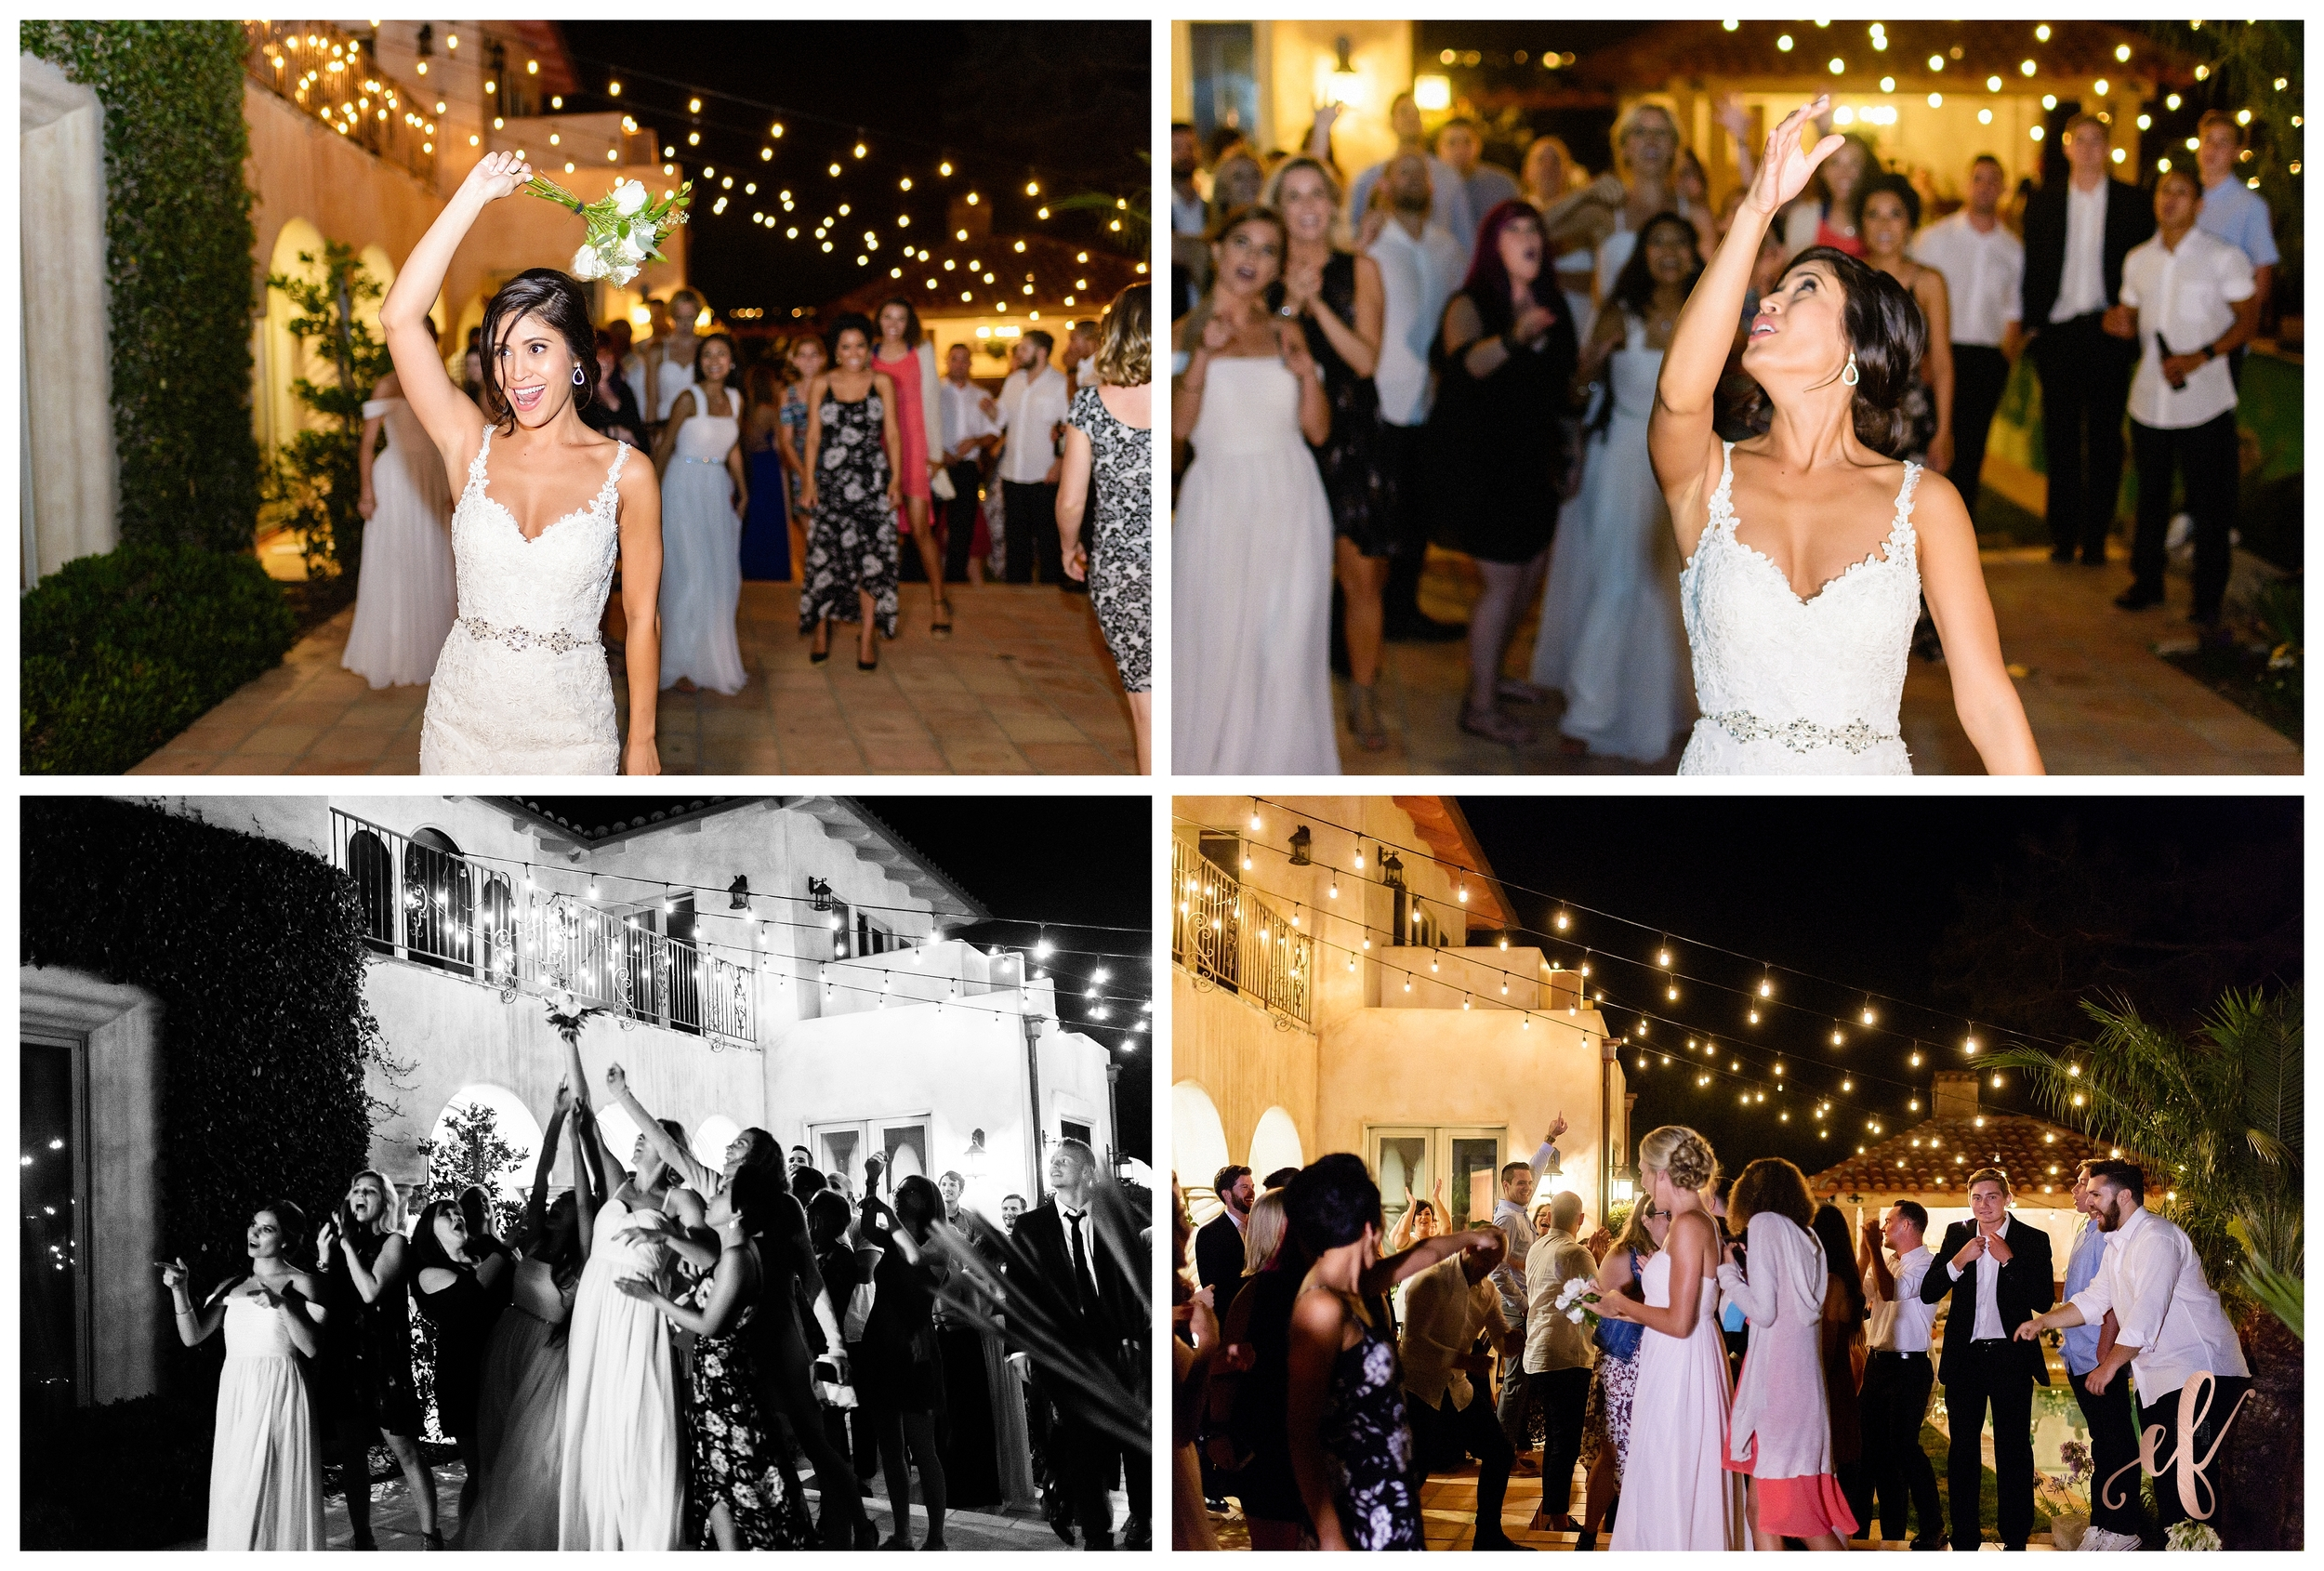 San Diego Wedding Photographer   Ernie & Fiona Photography   Bride   Bouquet Toss